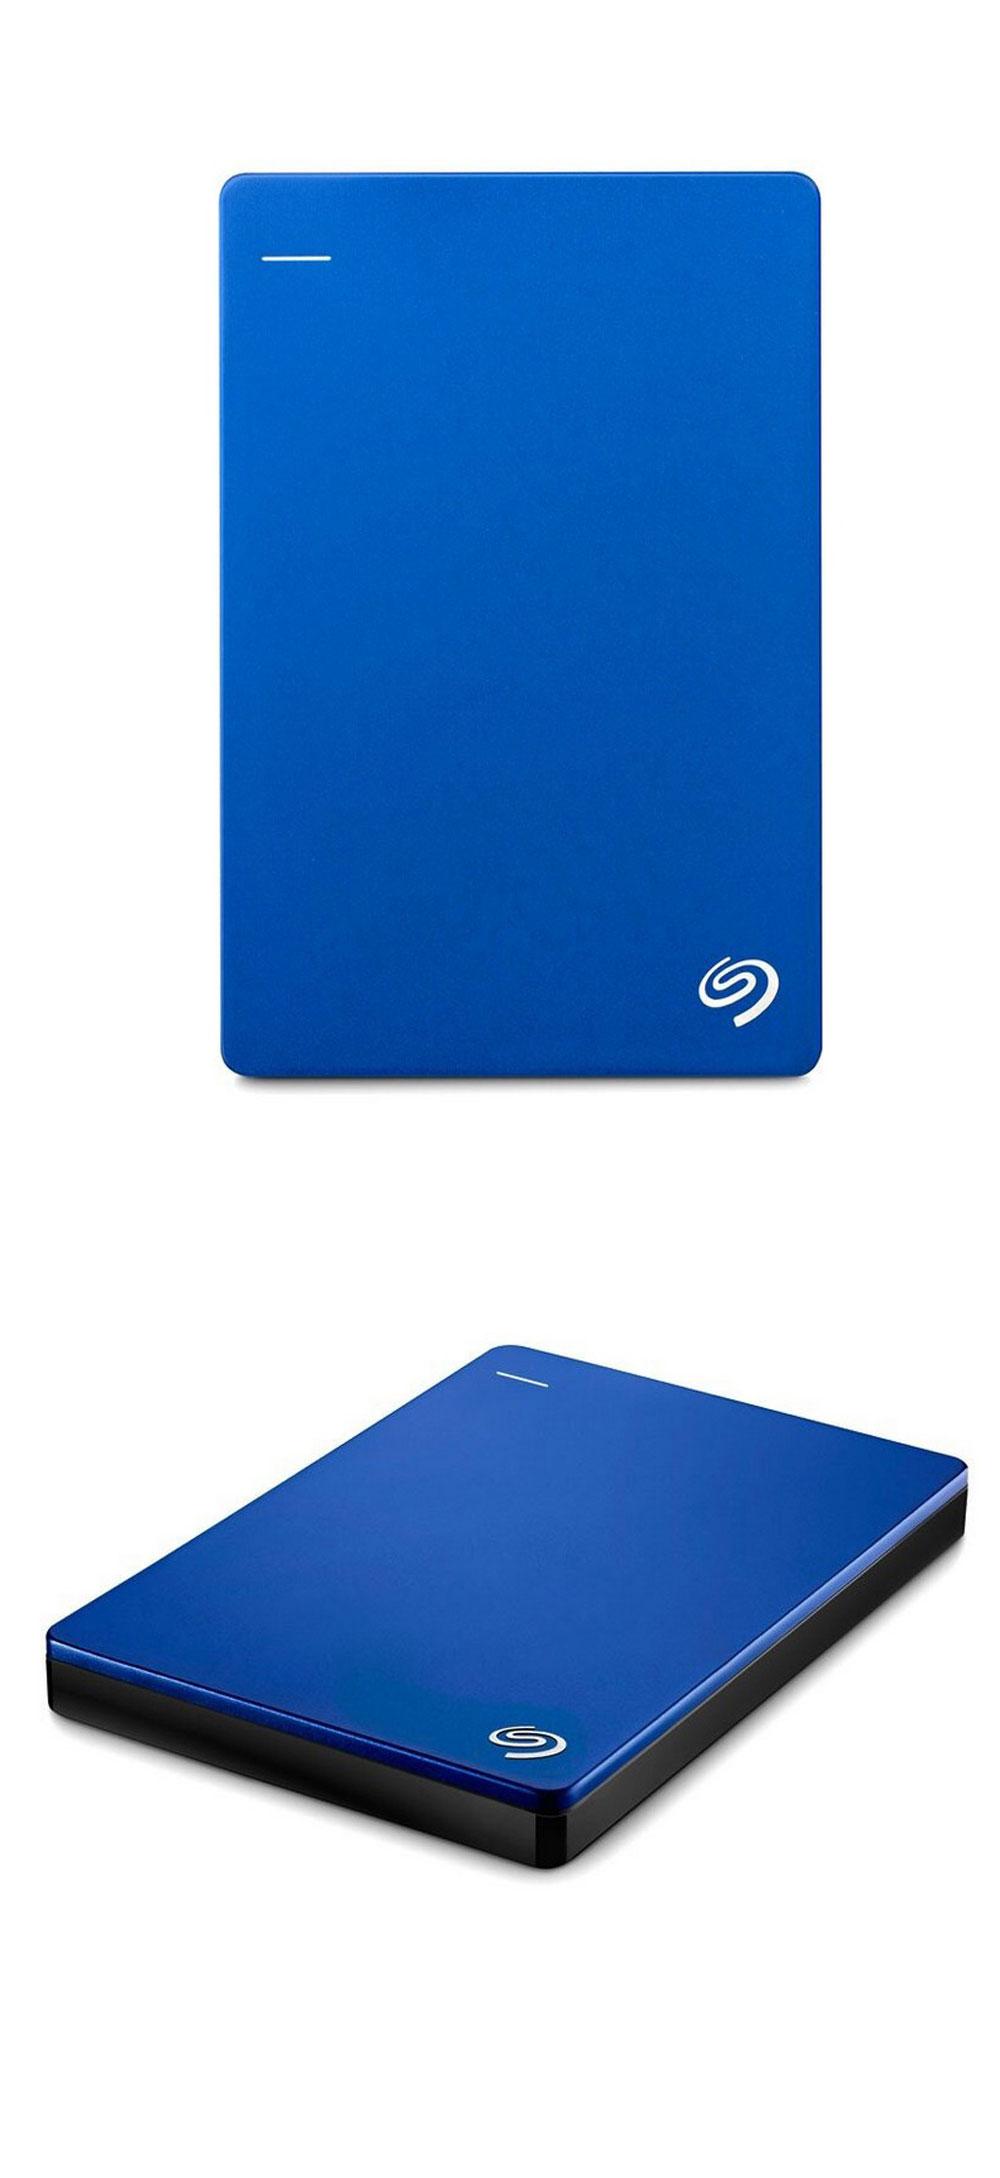 Seagate-External-HDD-Disk-1TB_07